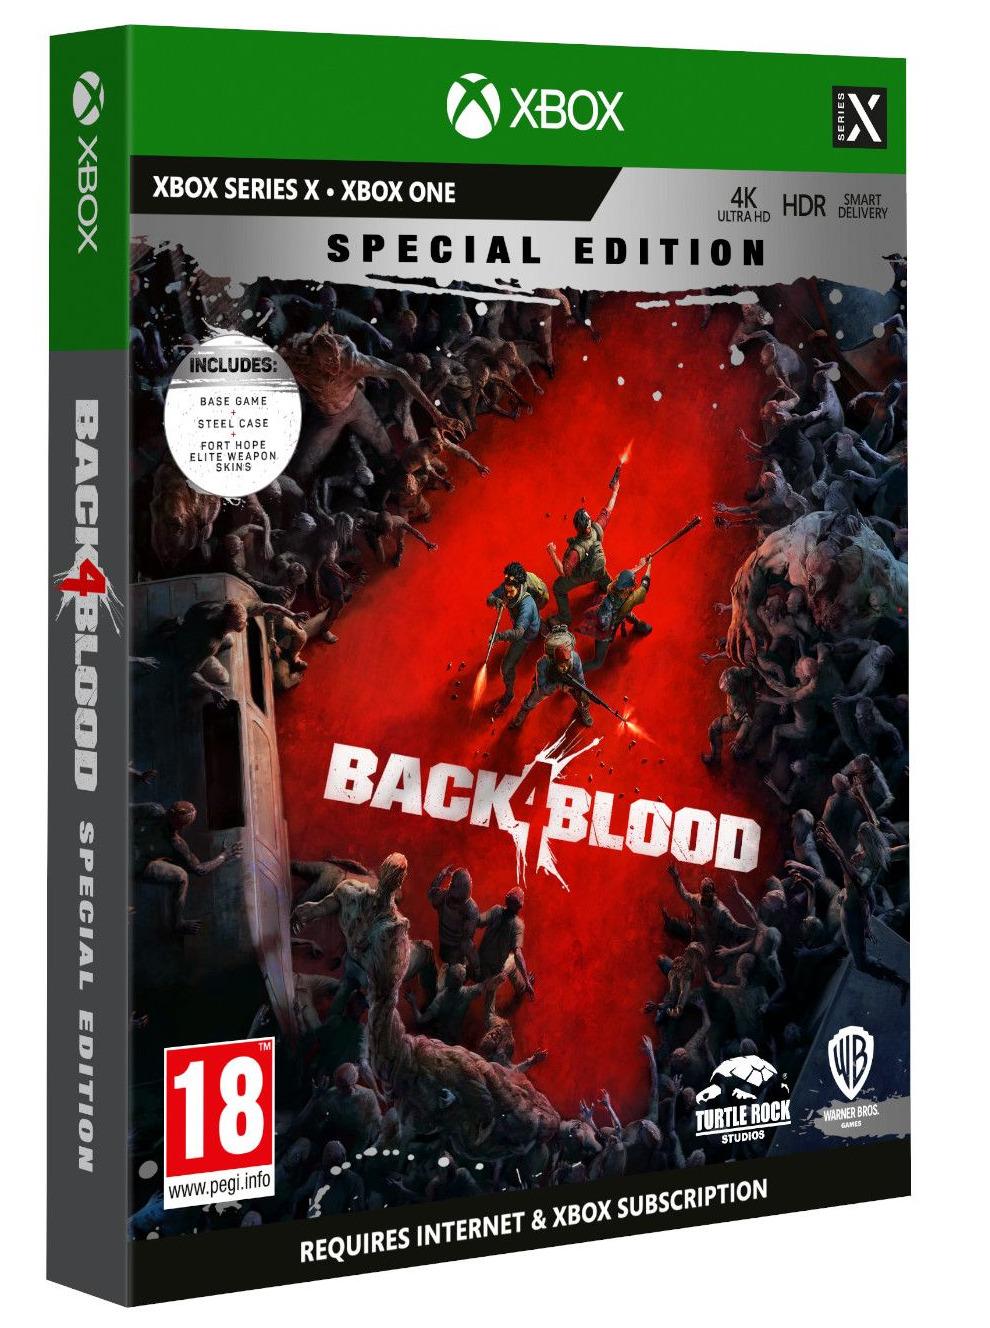 Back 4 Blood (XBOX)